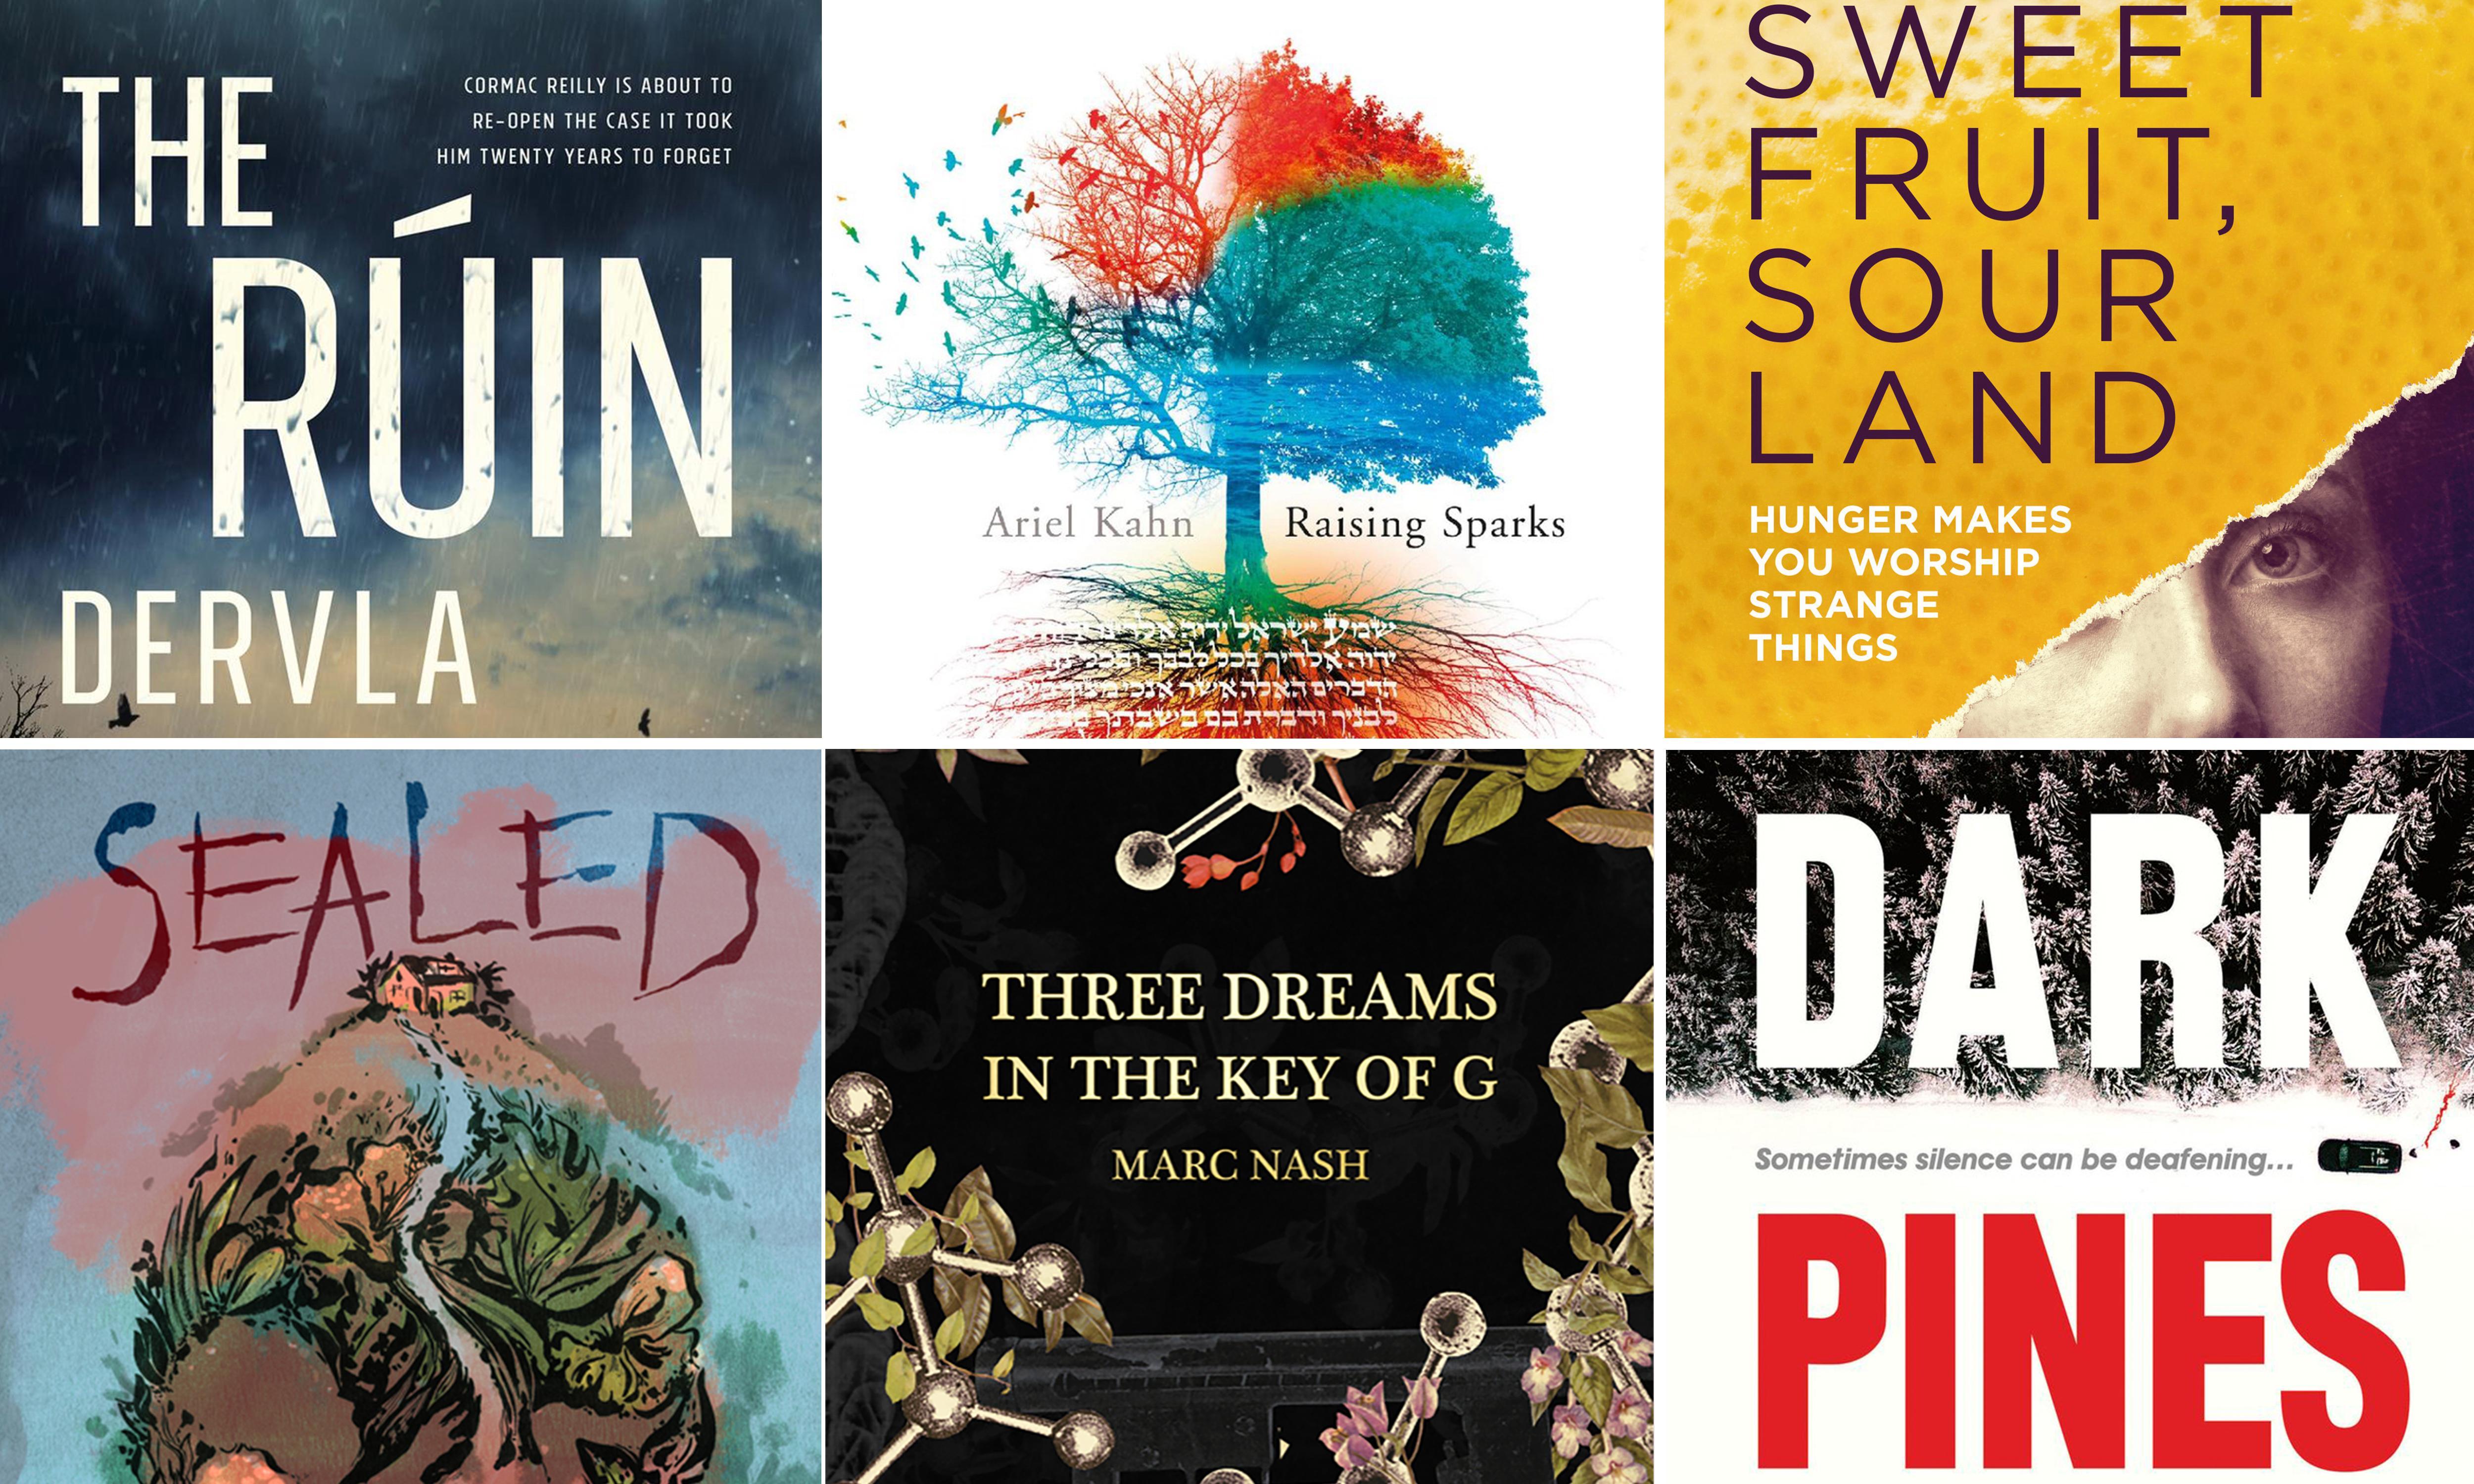 'A tour de force': wildcard novel completes Not the Booker prize shortlist